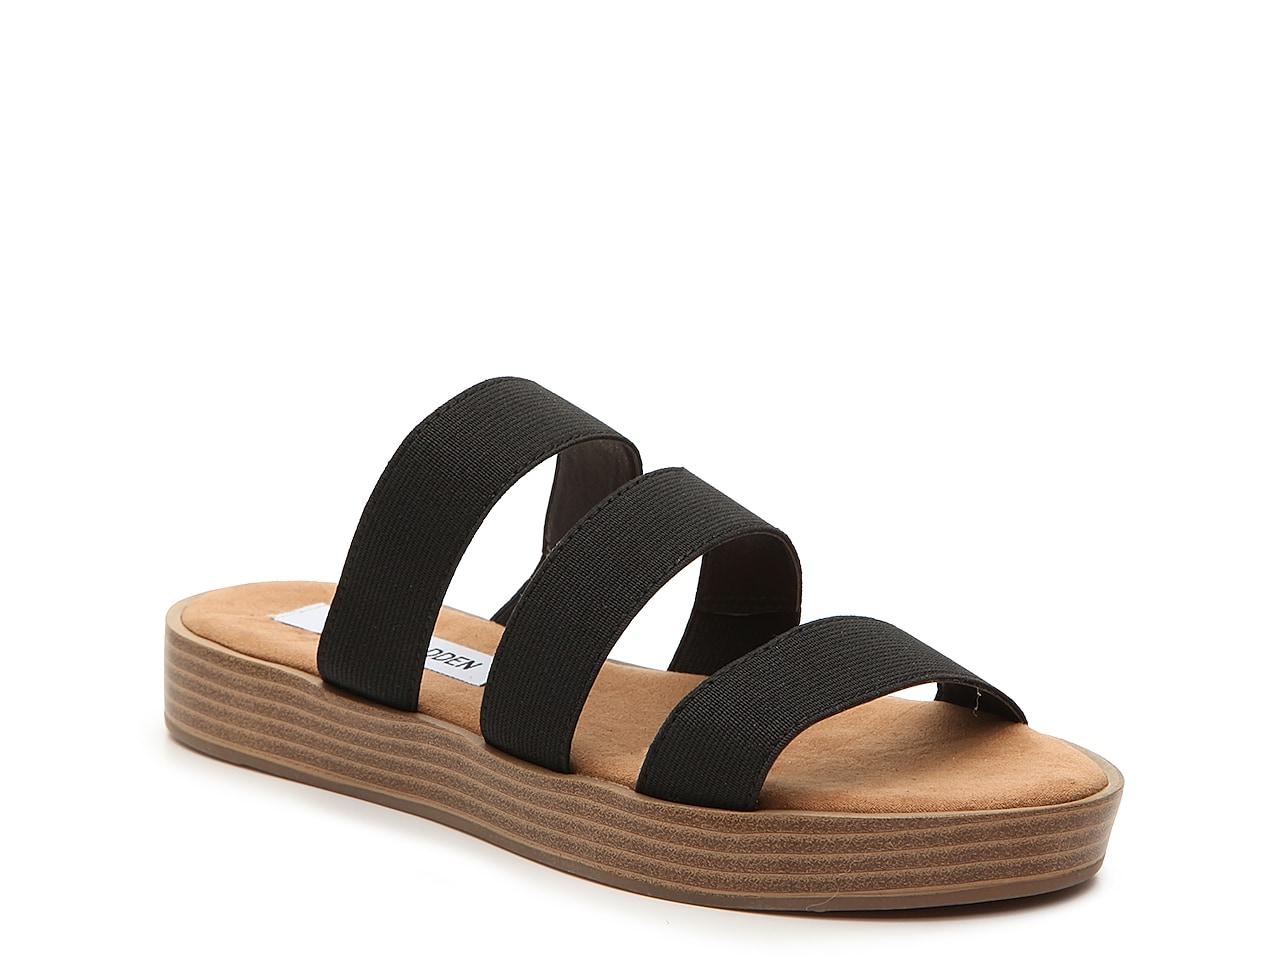 Glyn 3 Platform Sandal